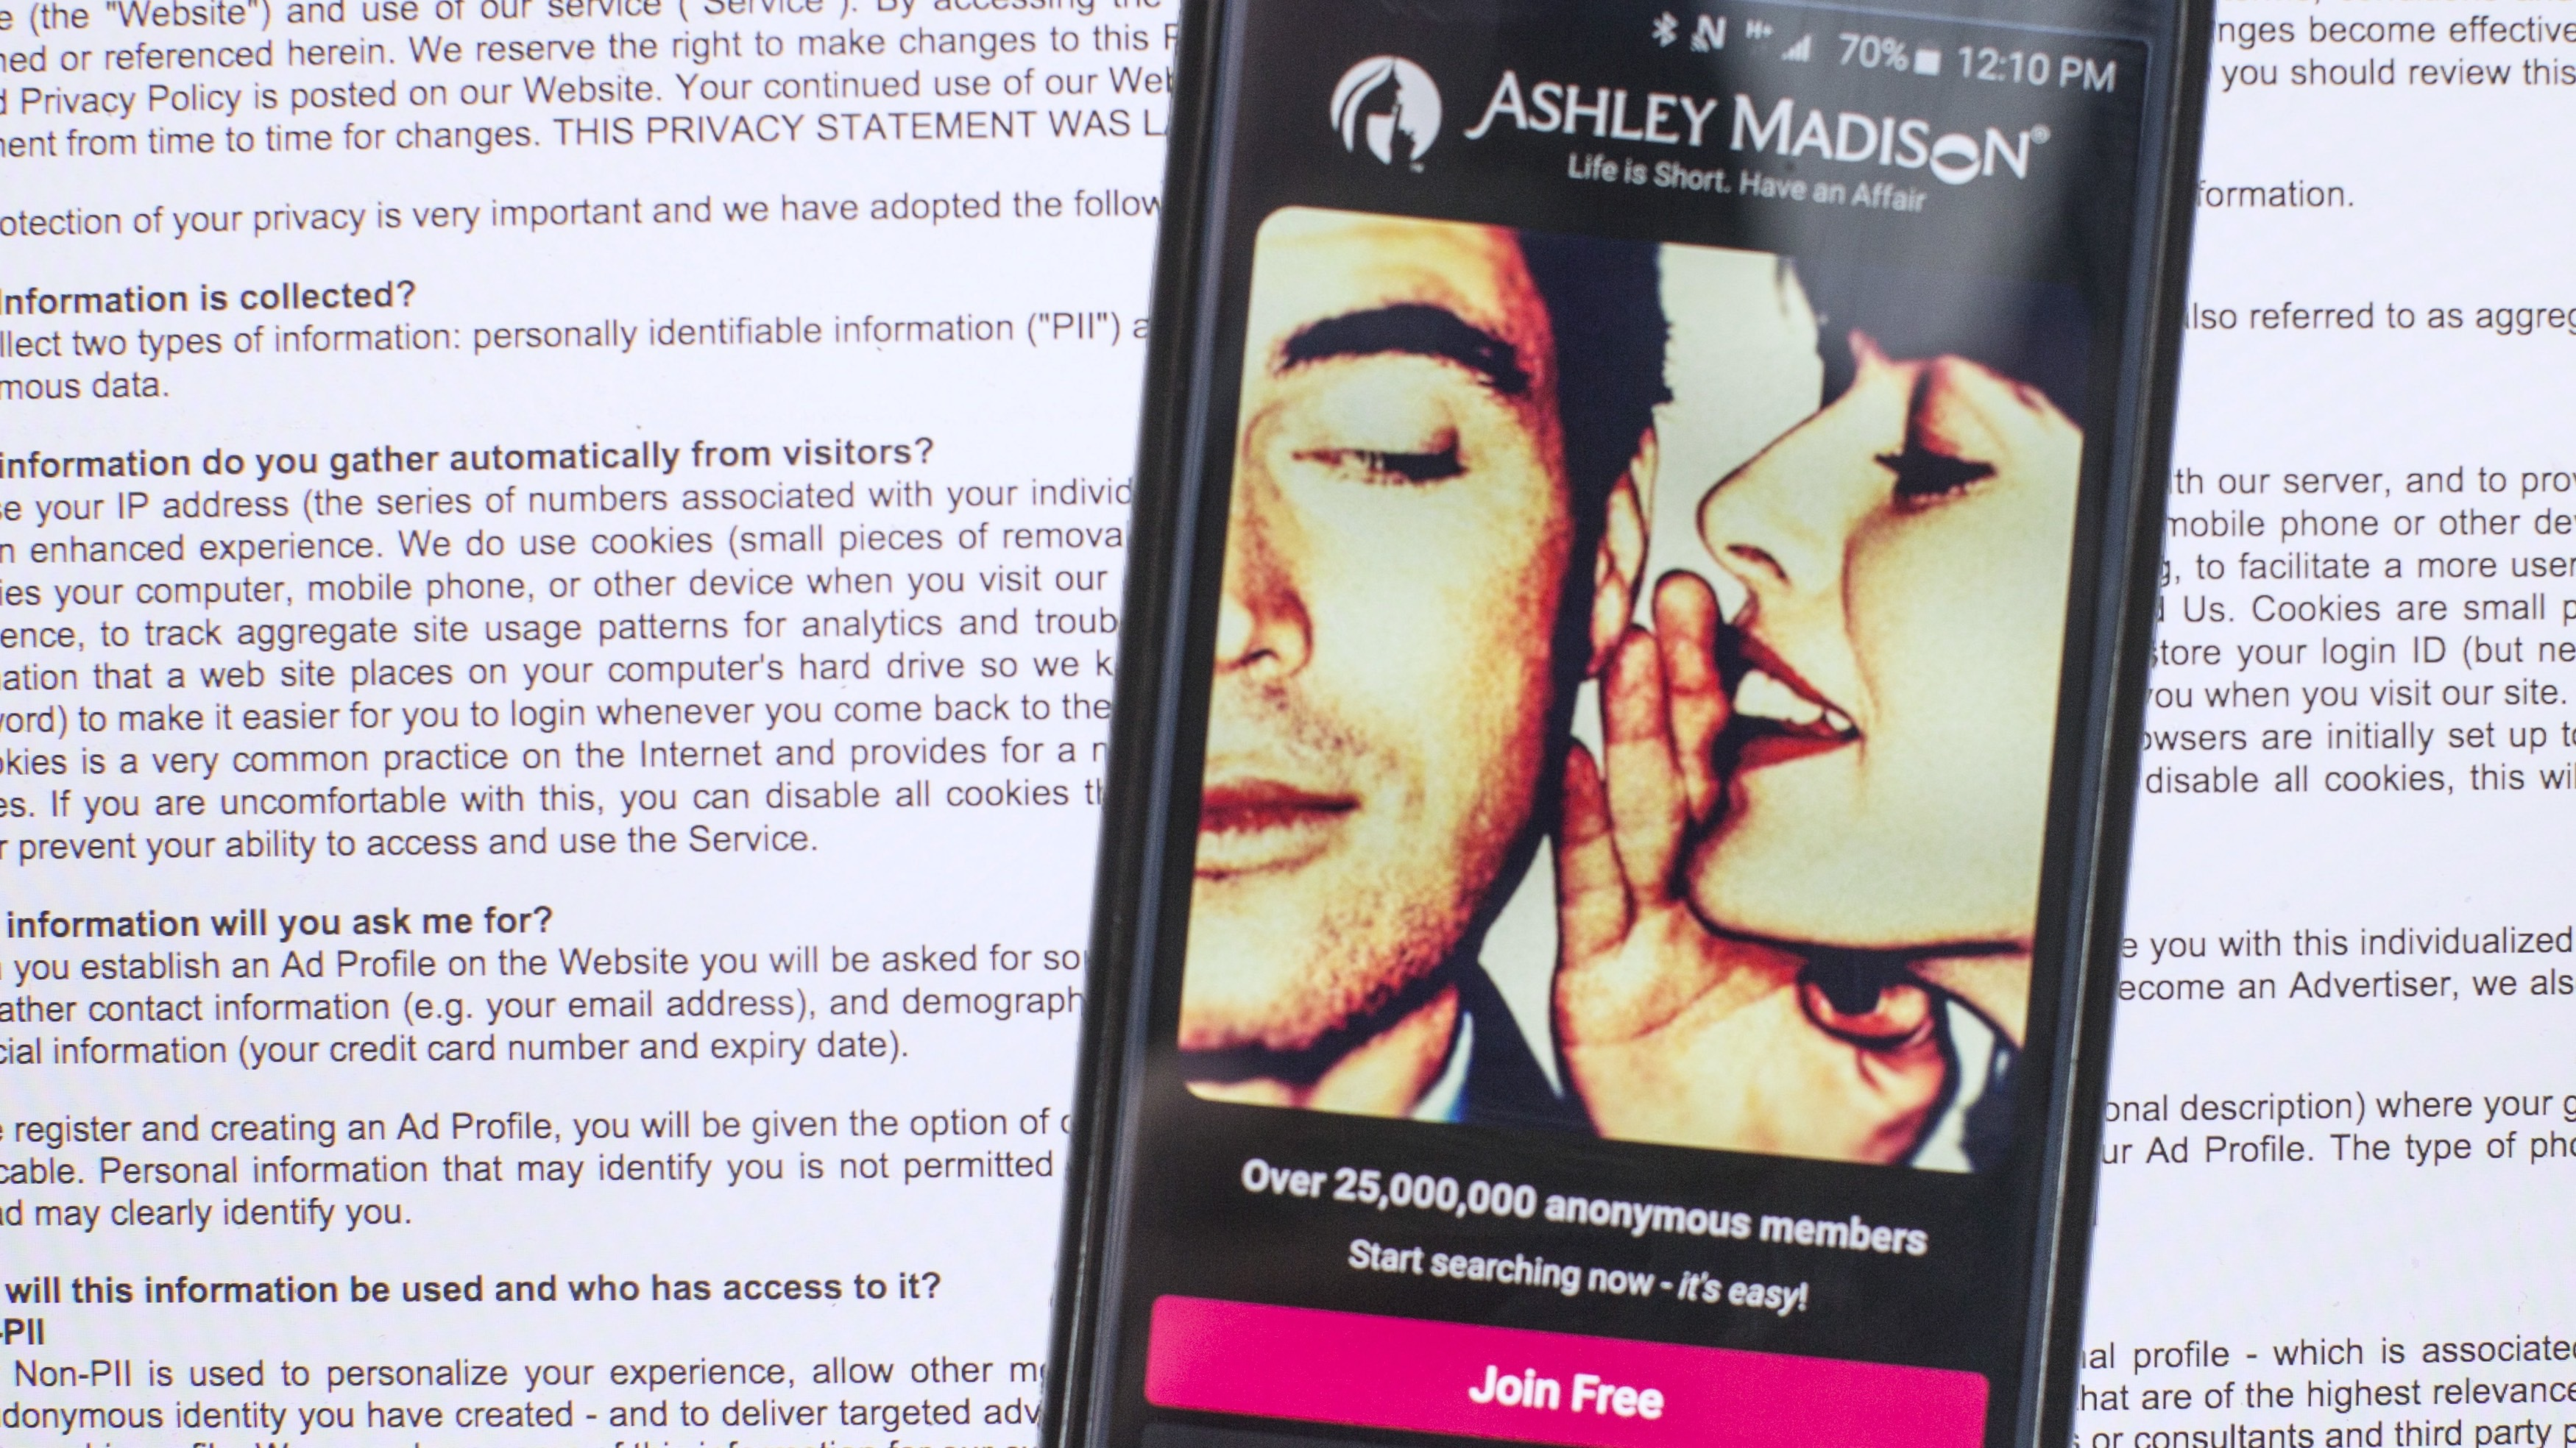 Ashley website for dating